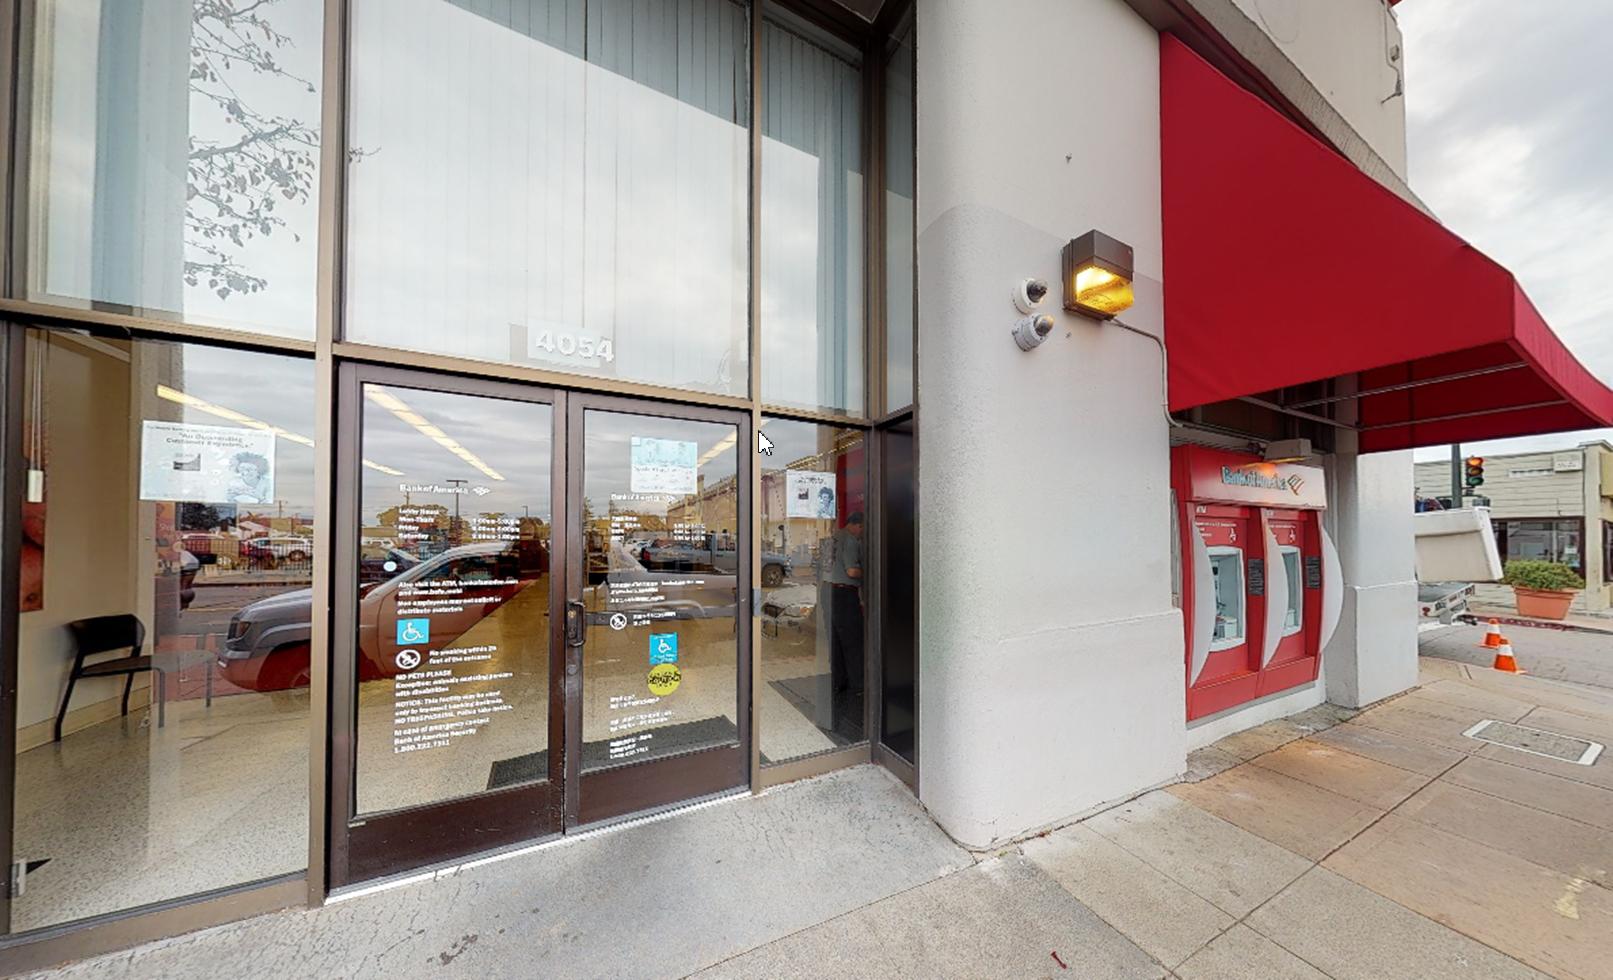 Bank of America financial center with walk-up ATM | 4054 MacArthur Blvd, Oakland, CA 94619